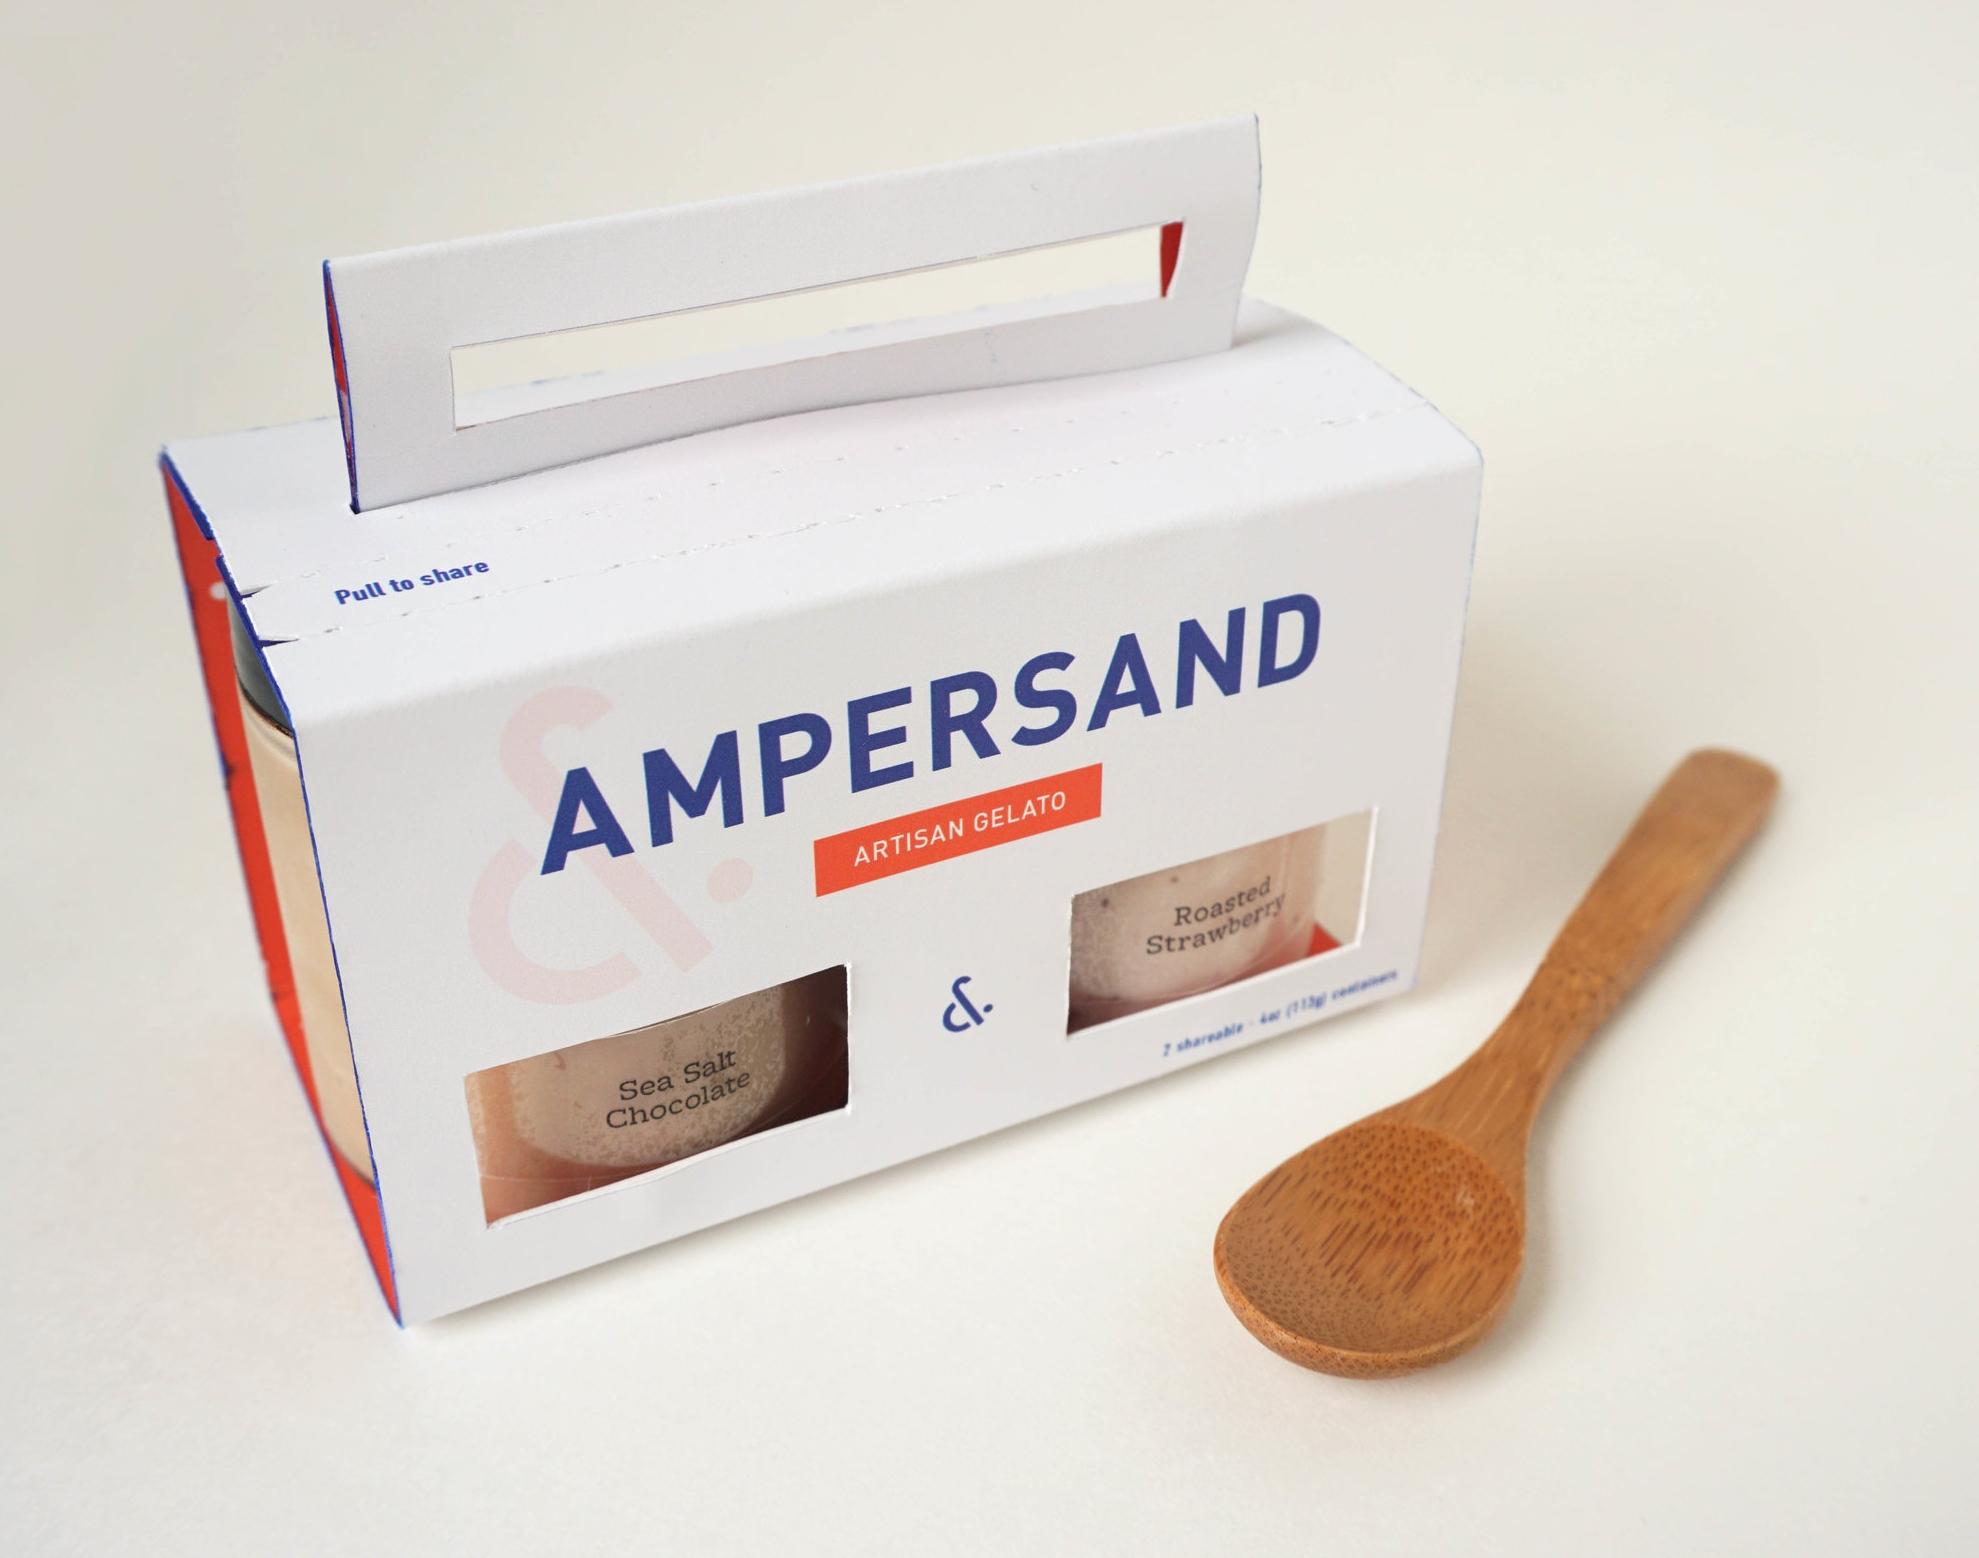 Ampersand Gelato - SEE MORE